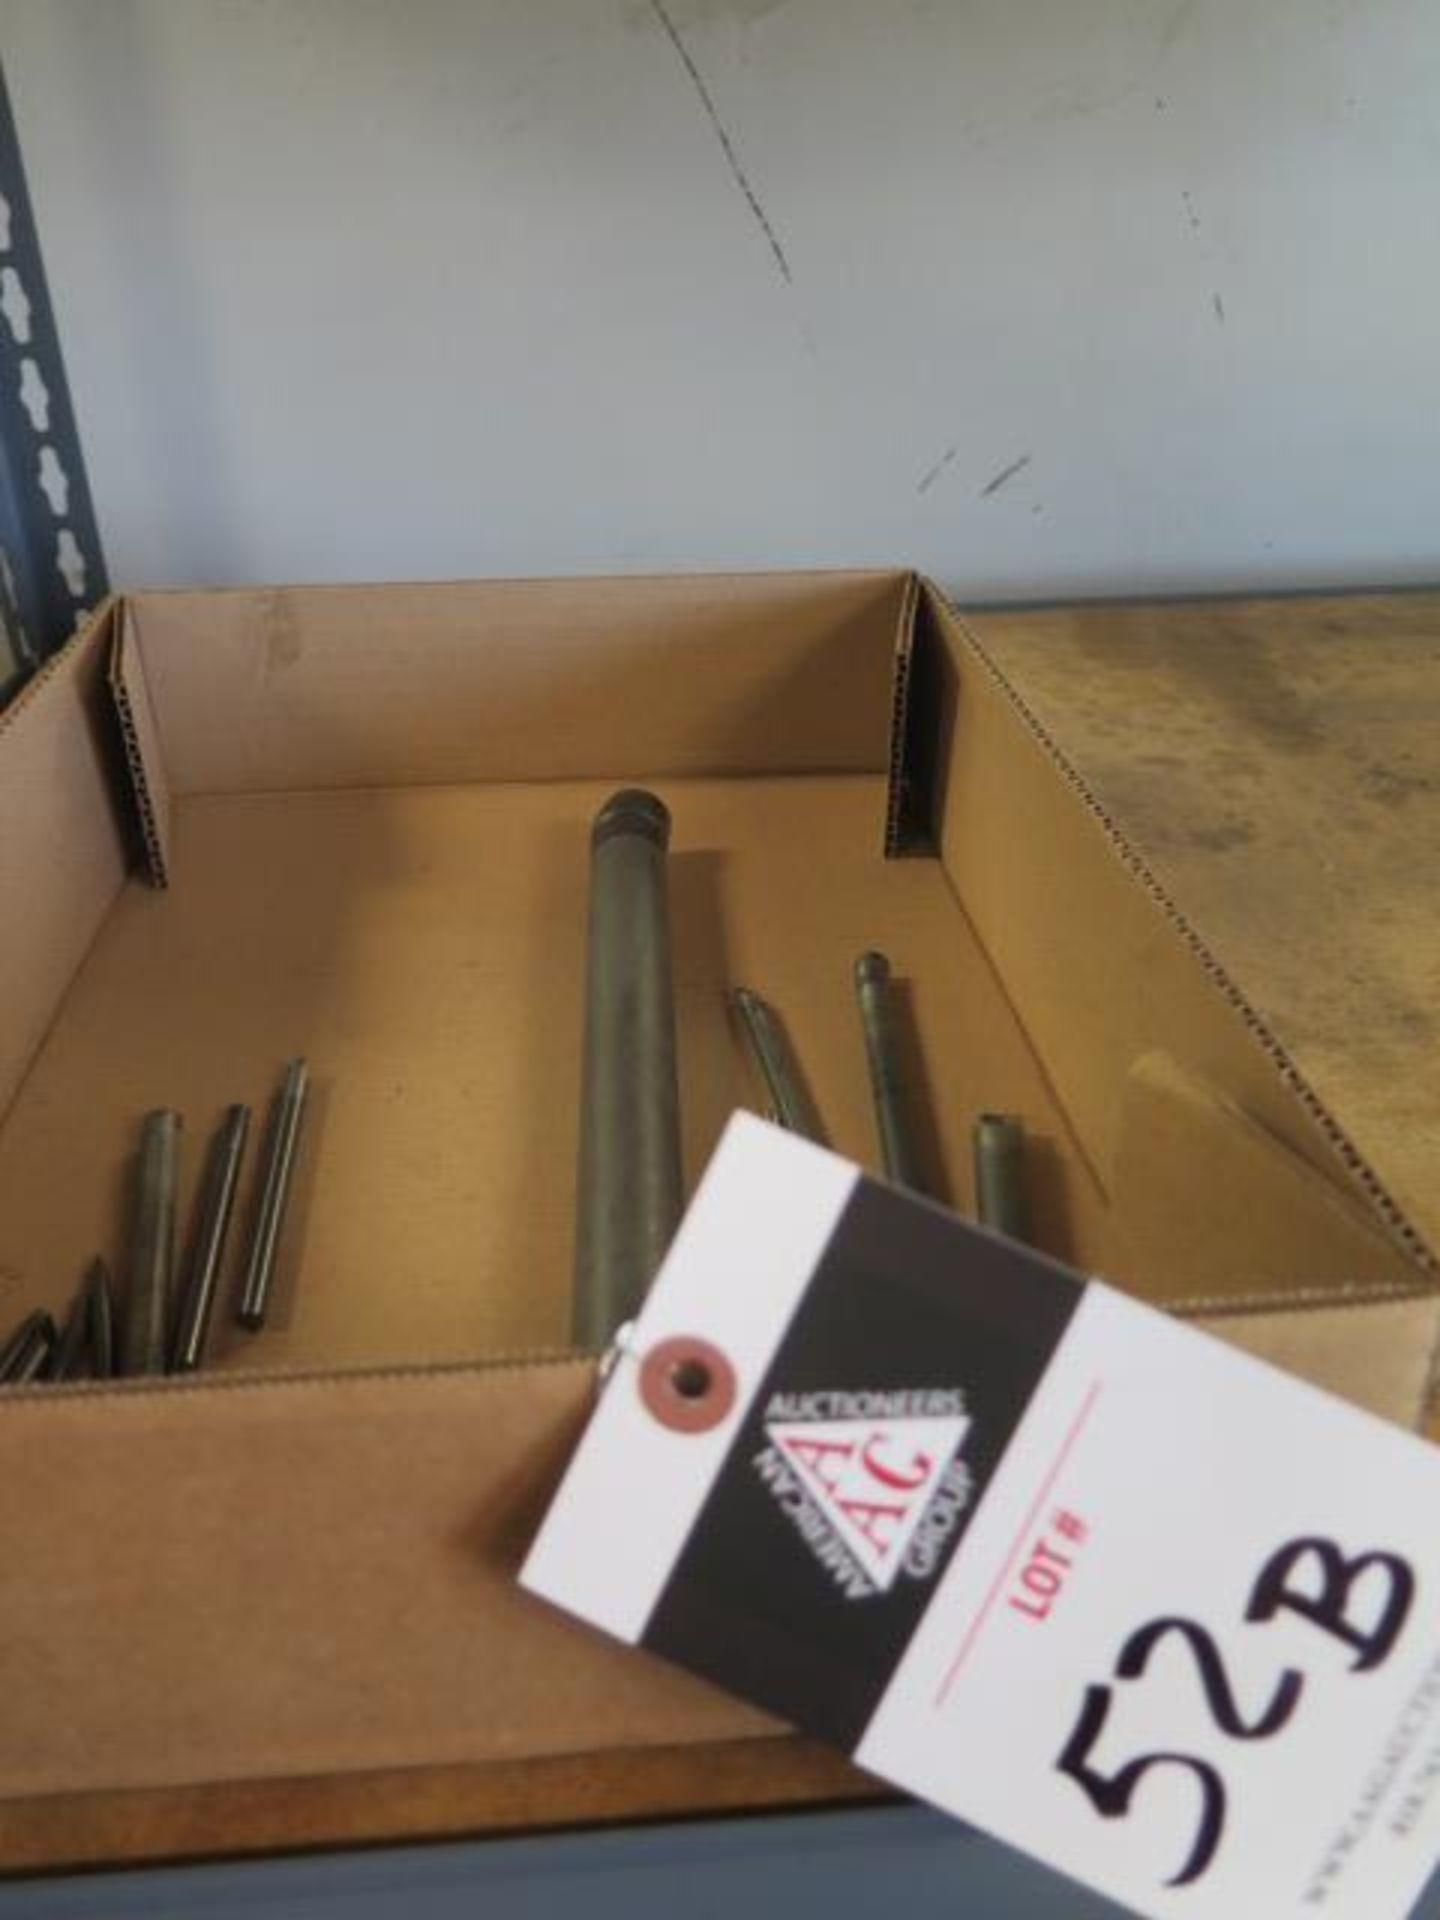 Carbide Shank Insert Boring Bars (SOLD AS-IS - NO WARRANTY)